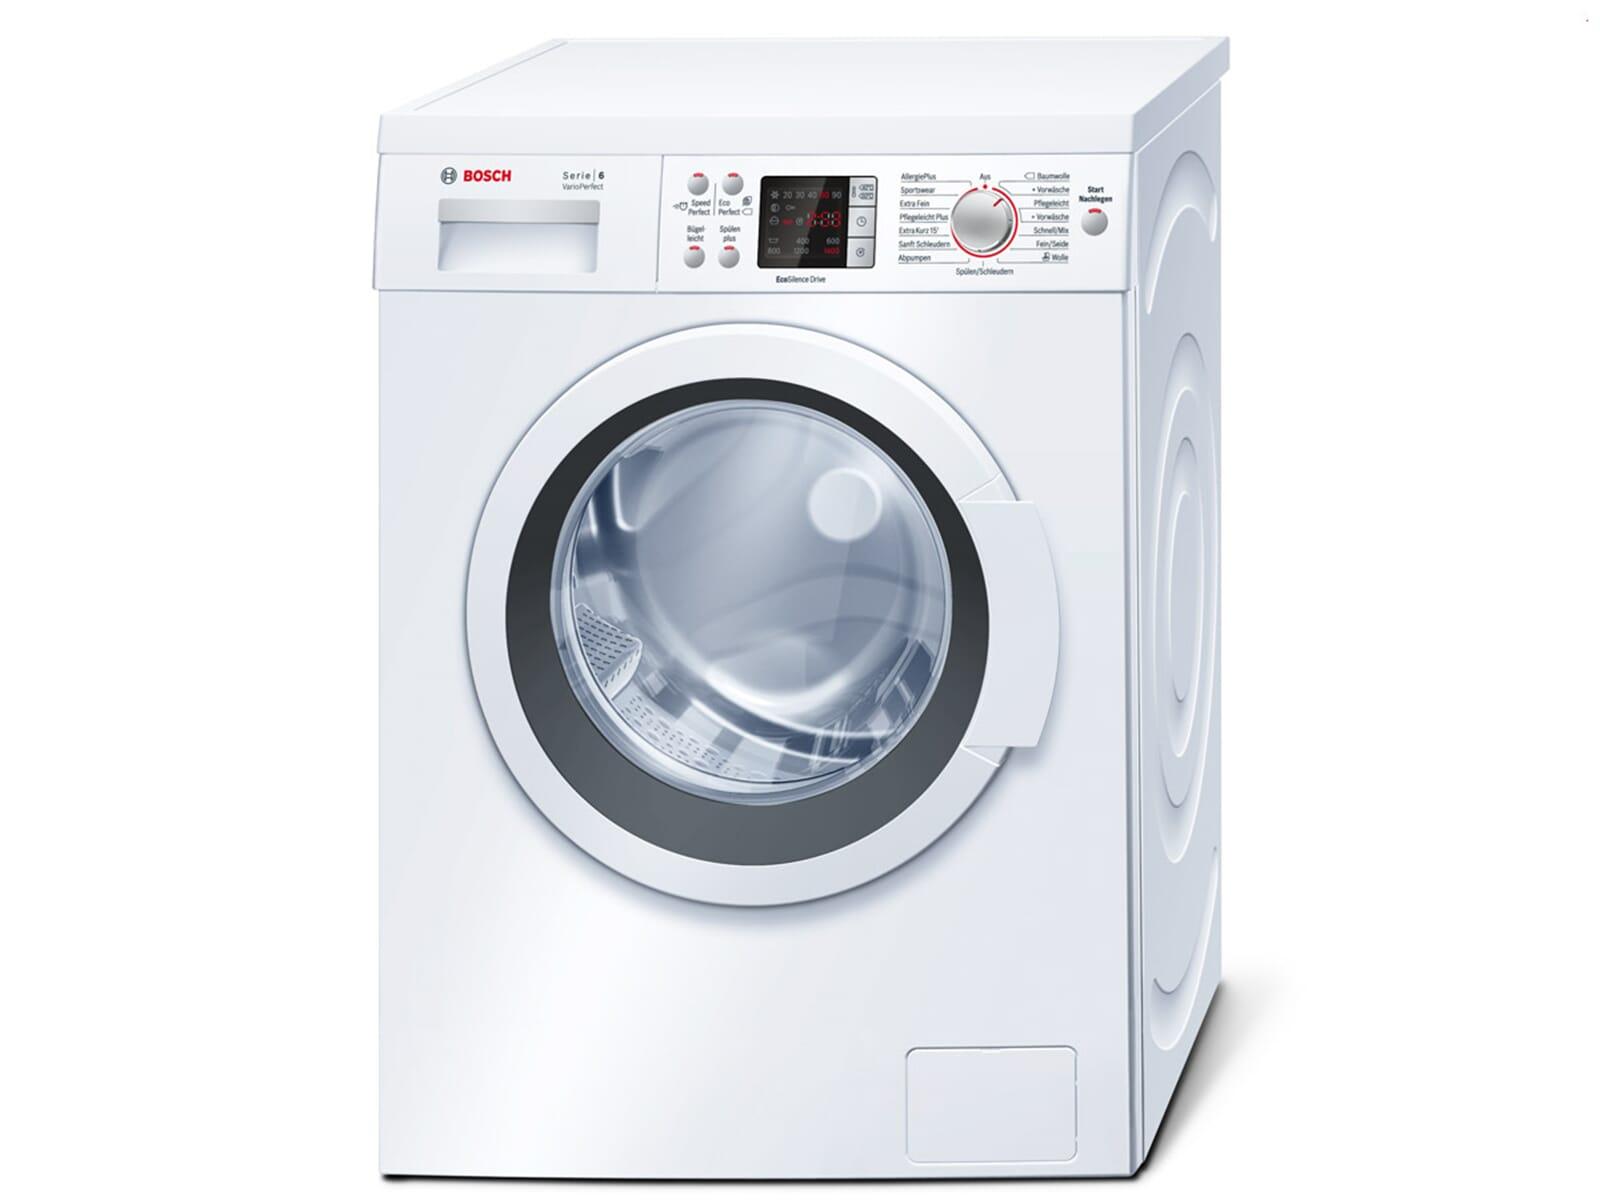 bosch waq28422 stand waschmaschine wei waschvollautomat frontlader 7kg ebay. Black Bedroom Furniture Sets. Home Design Ideas